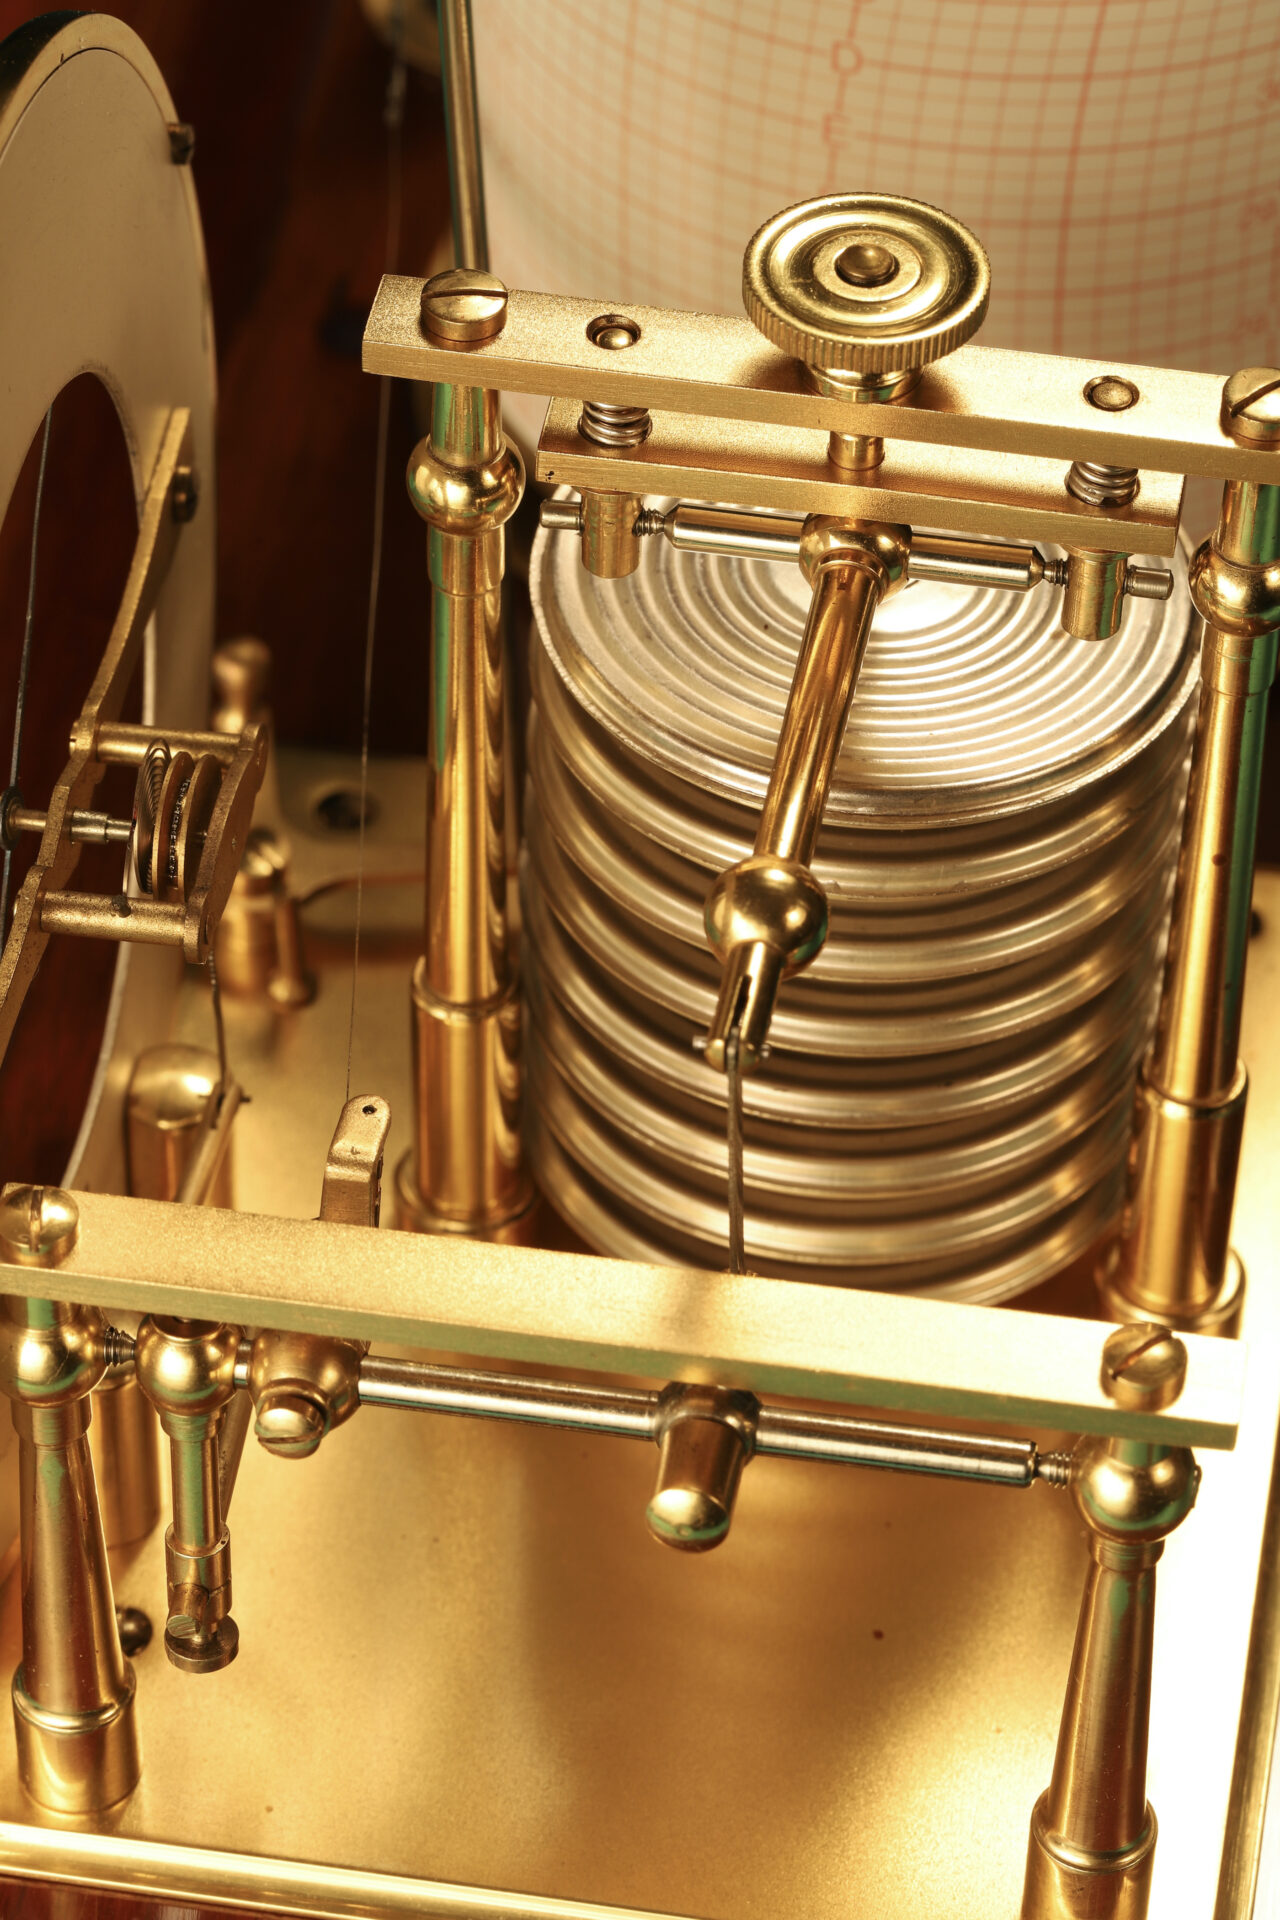 Image of capsule stack from Short & Mason Barograph No L13629 c1930